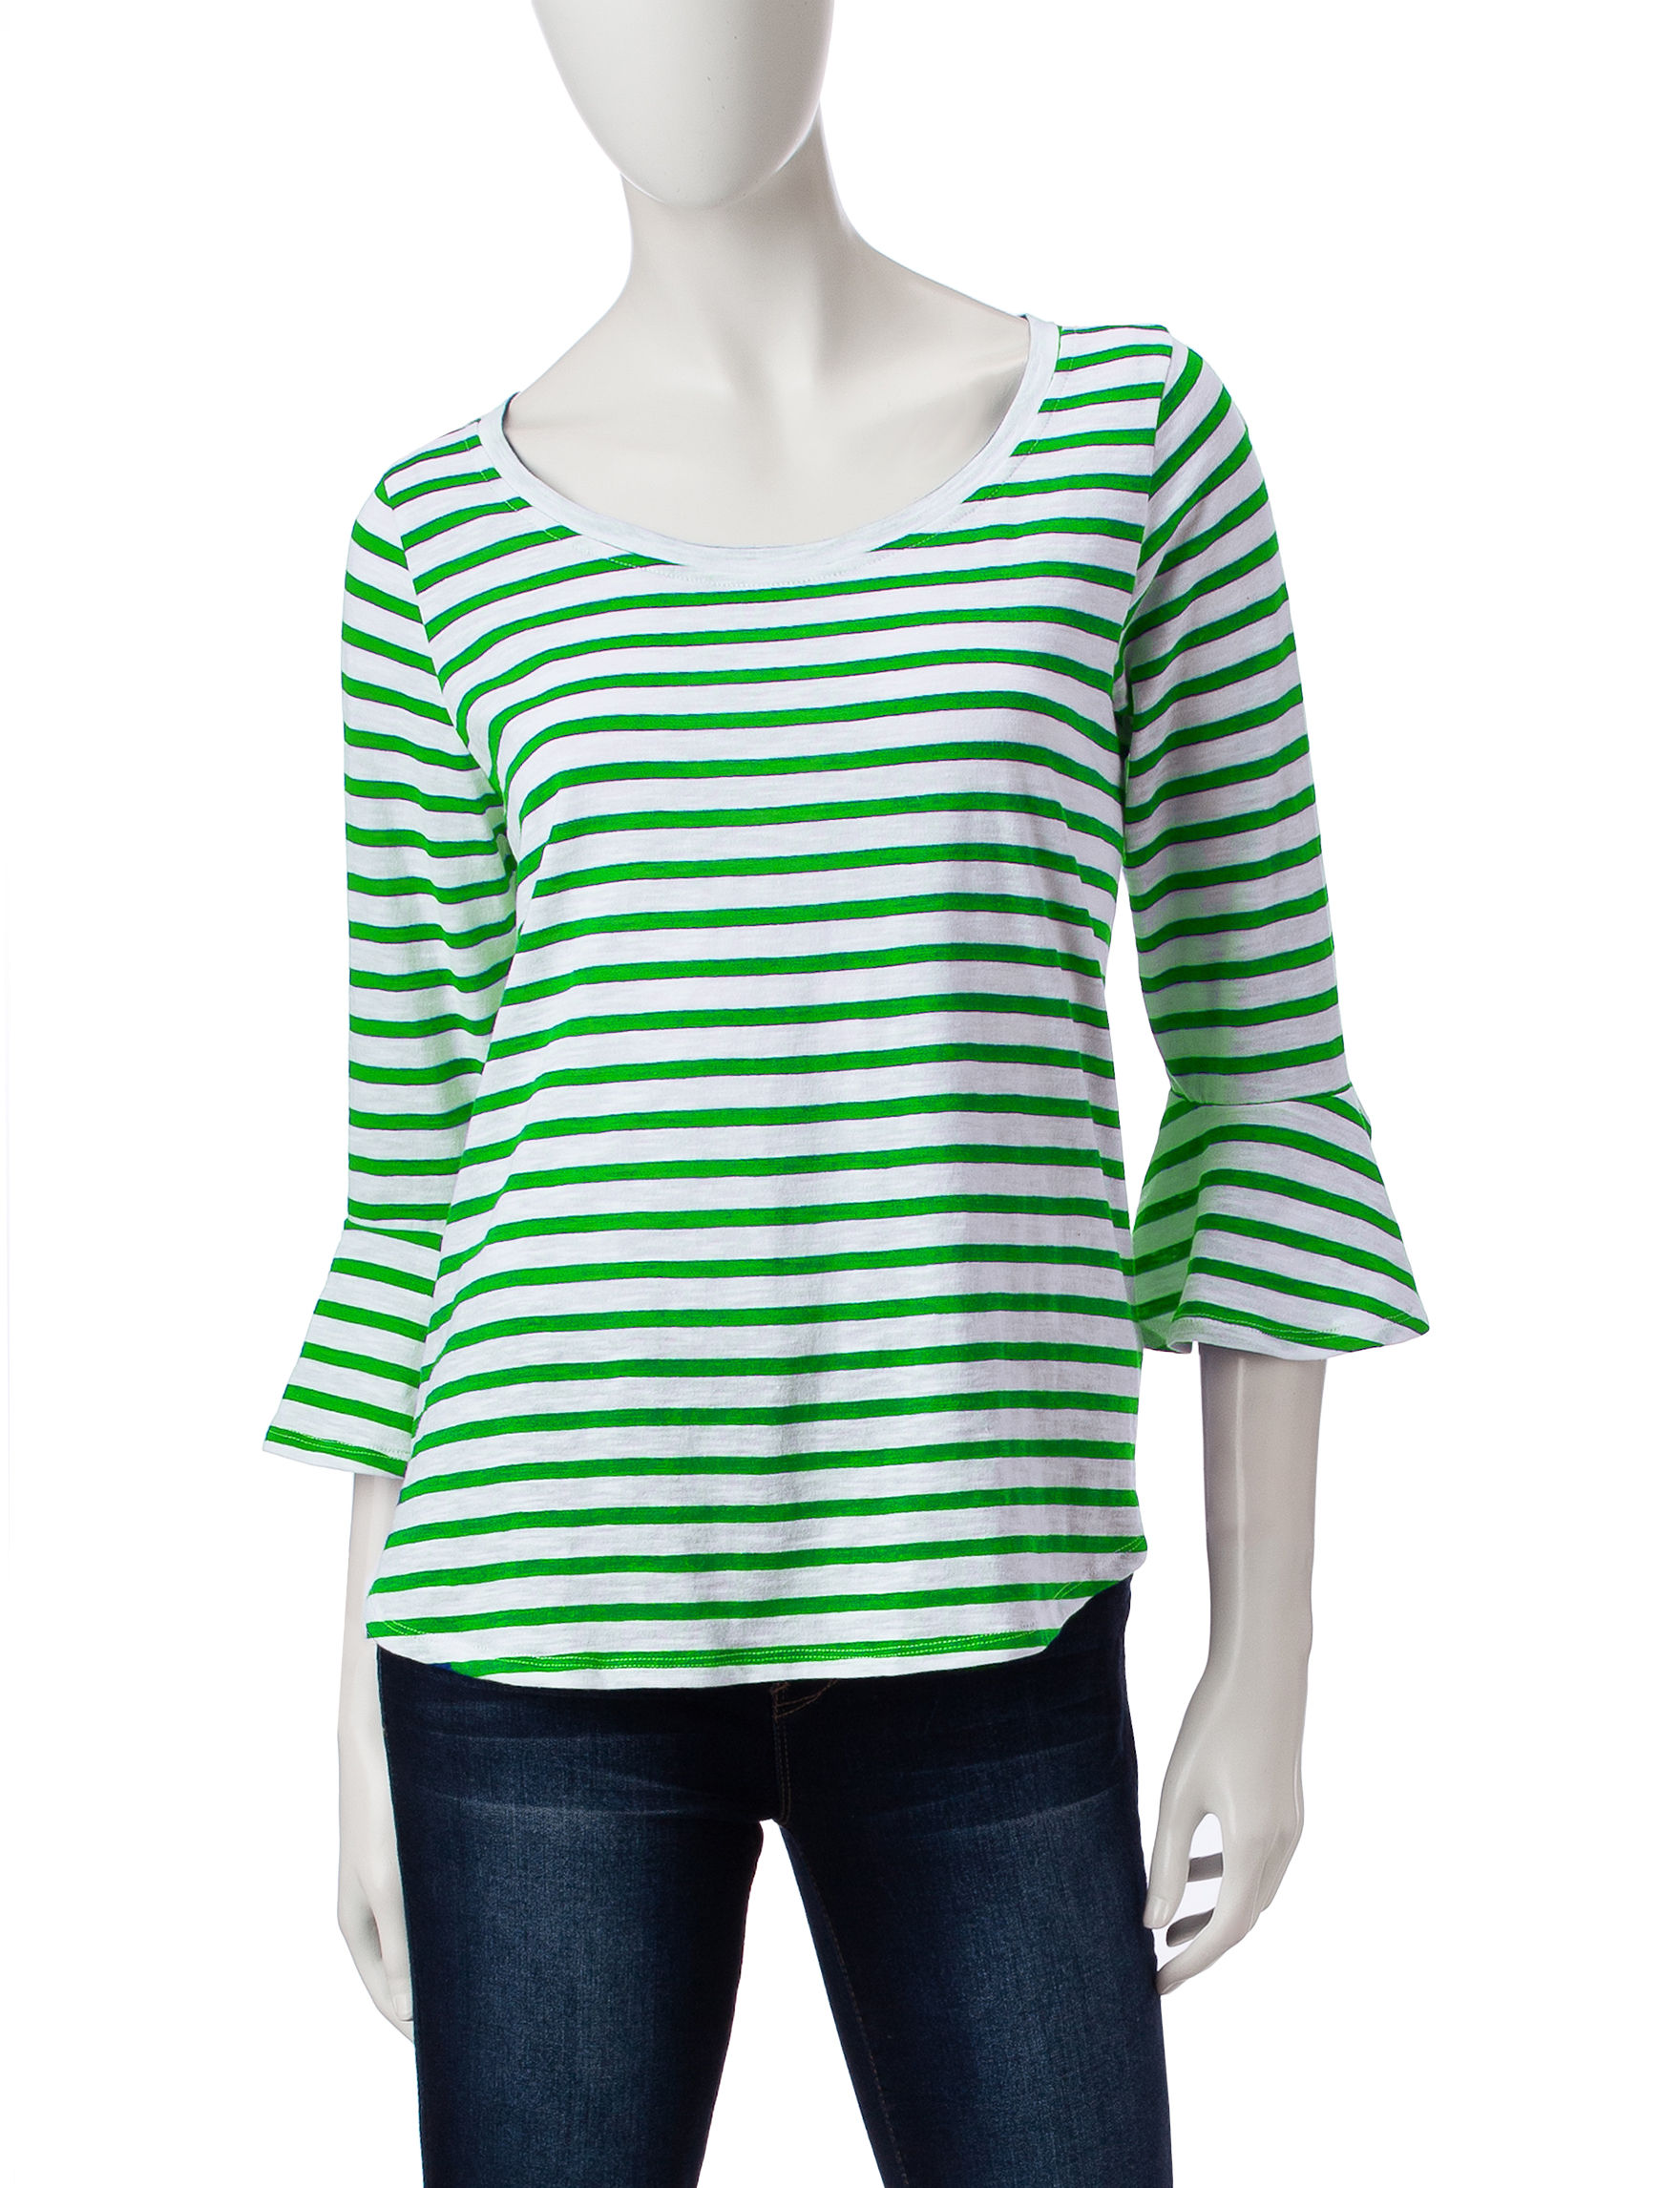 Hannah Green / White Shirts & Blouses Tees & Tanks